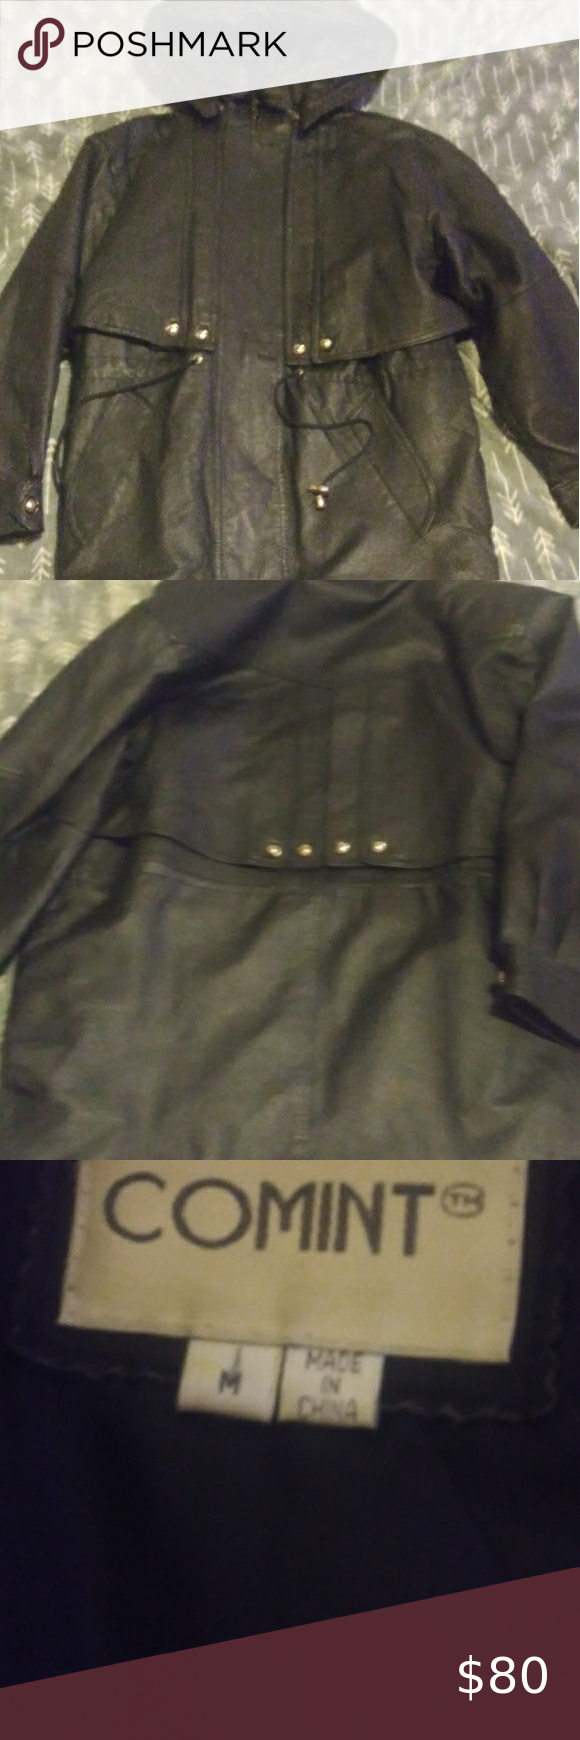 Women S Leather Coat W Hood Leather Coat Womens Leather Coat Leather Women [ 1740 x 580 Pixel ]